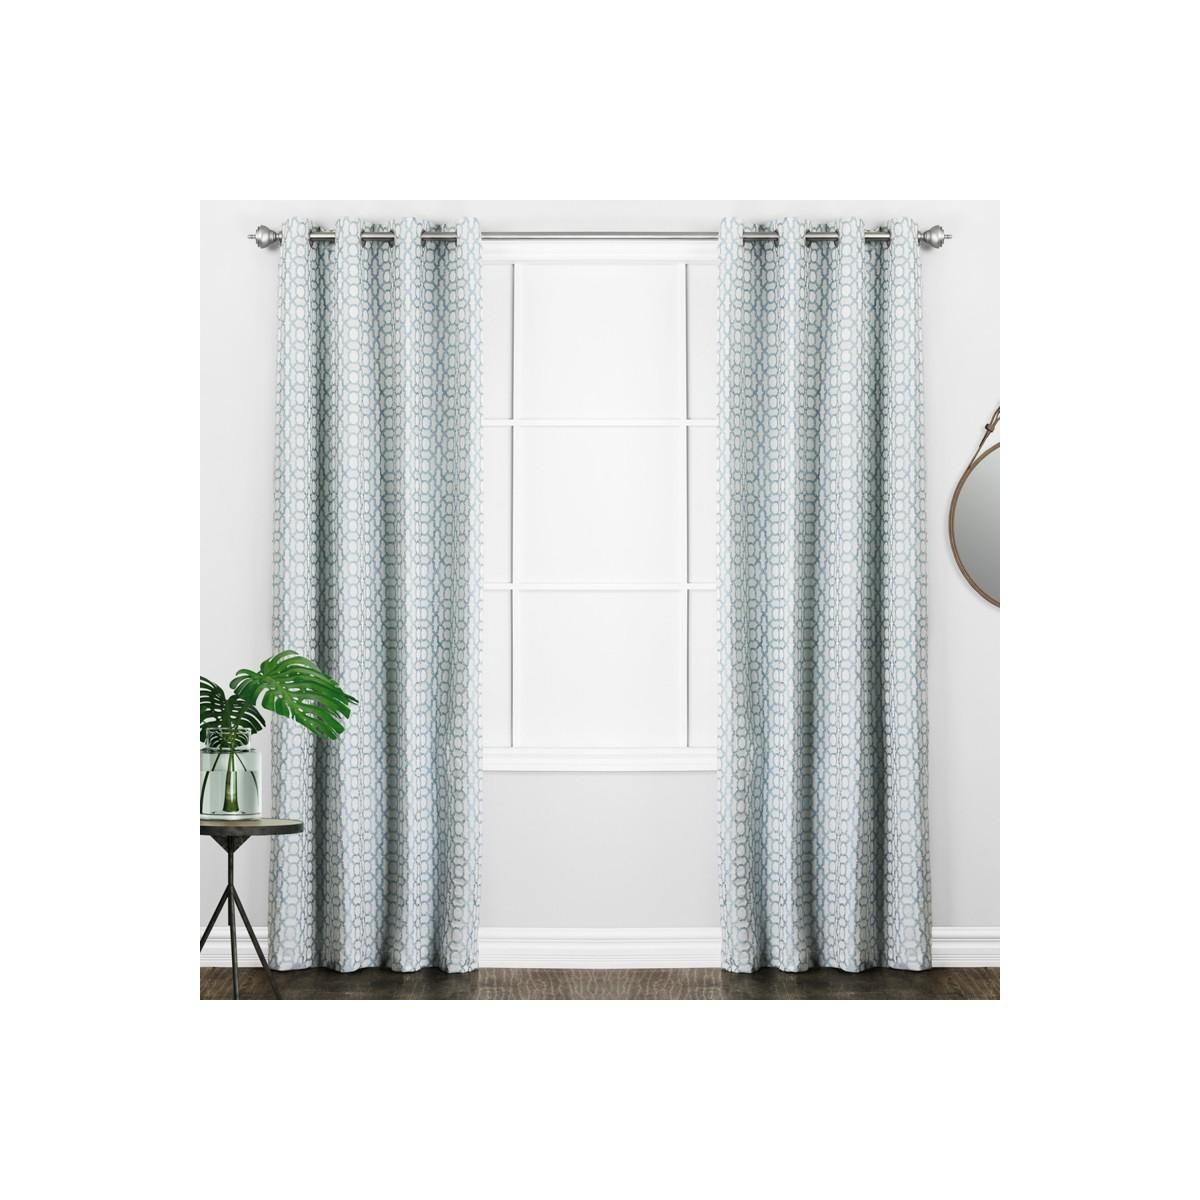 Texlima Stella Curtain Curtains Allure